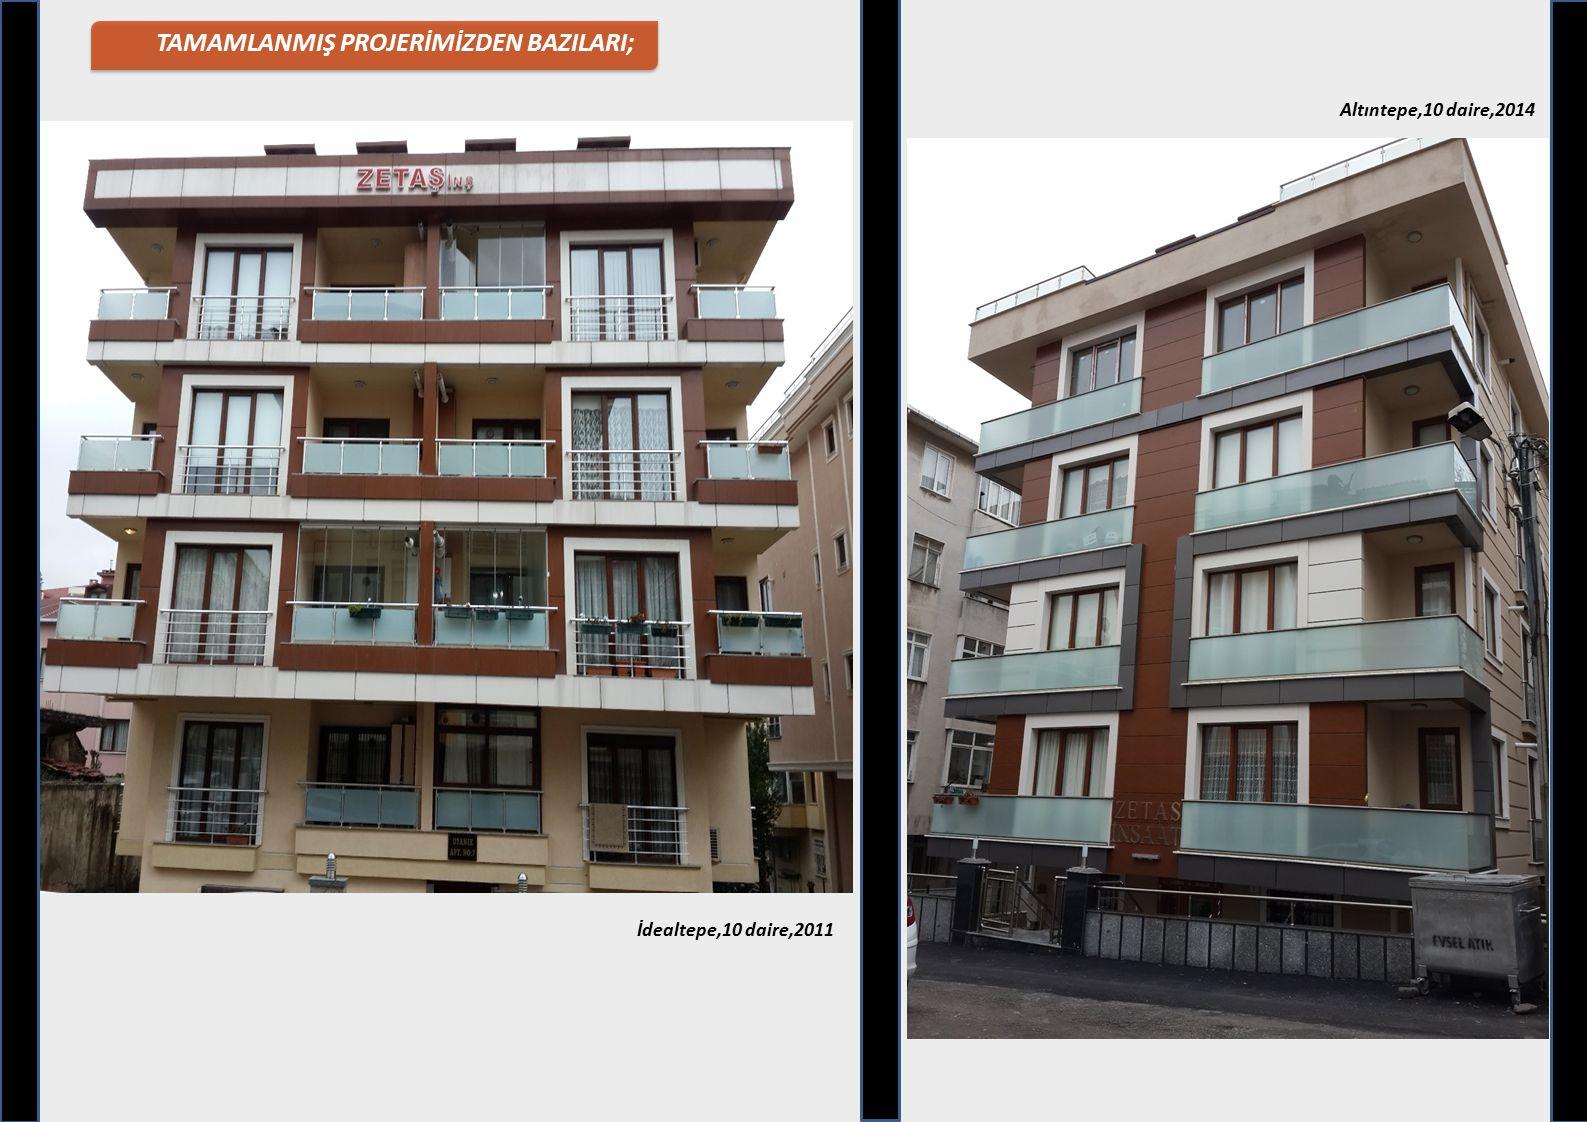 İdealtepe,10 daire,2011 Altıntepe,10 daire,2014 TAMAMLANMIŞ PROJERİMİZDEN BAZILARI;